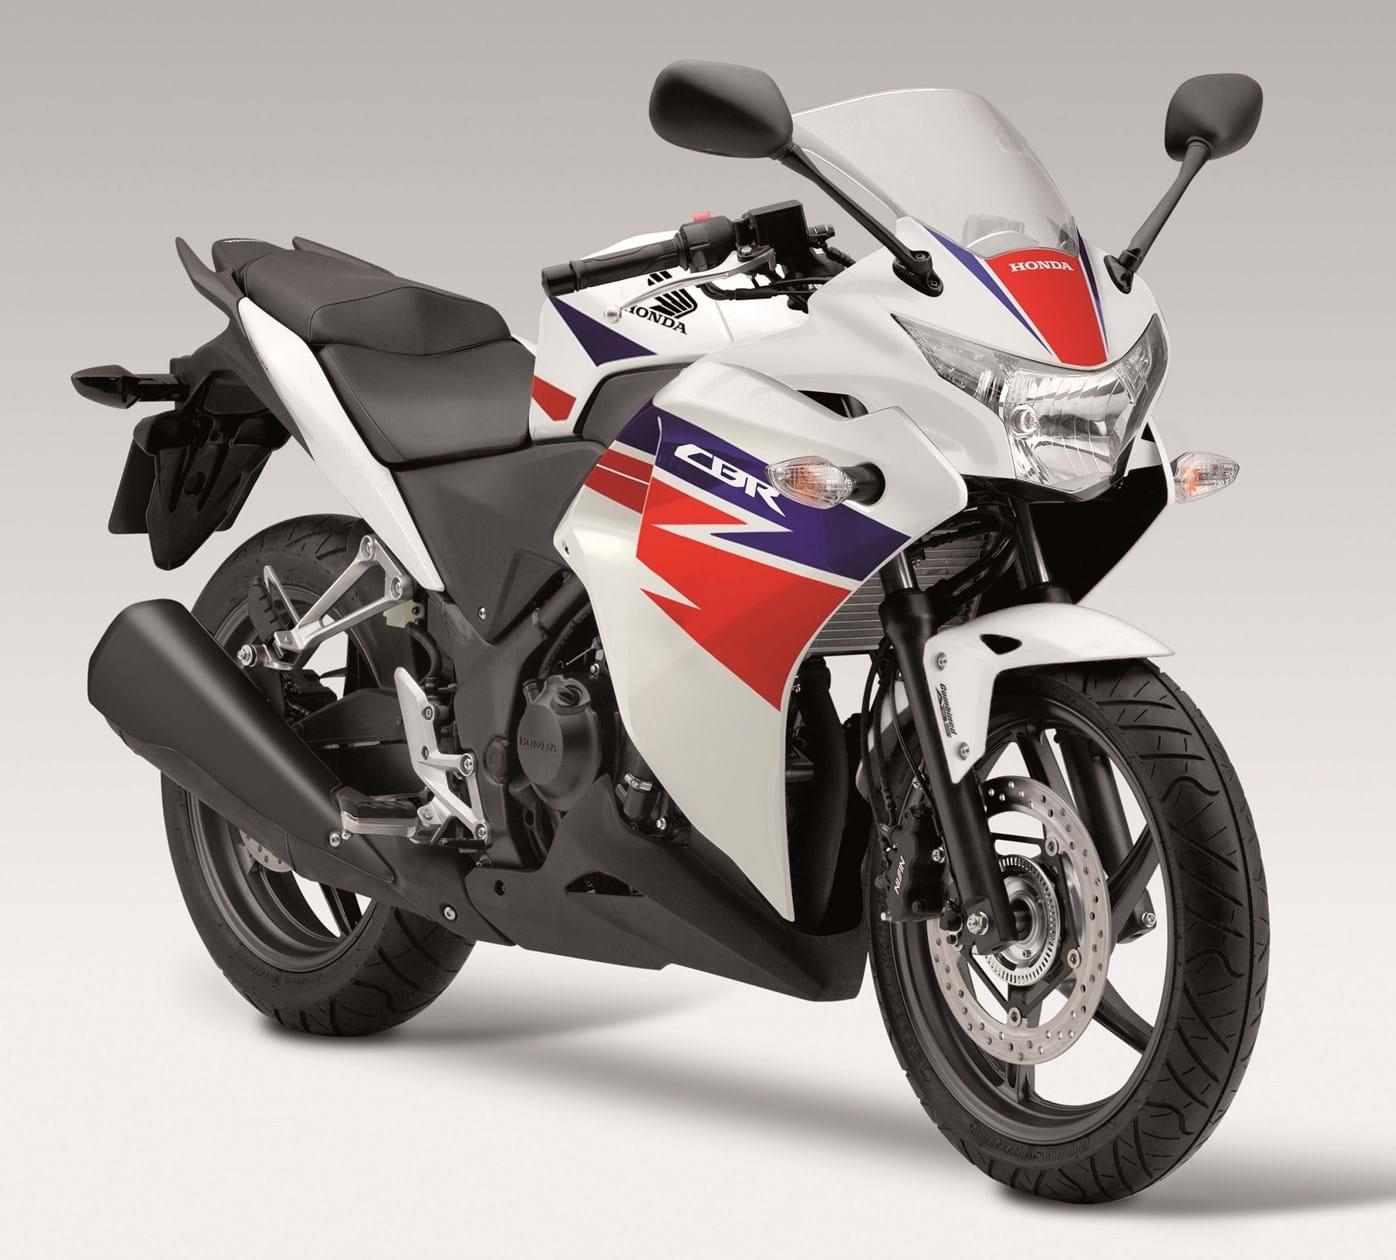 For Sale: Honda CBR250R • The Bike Market